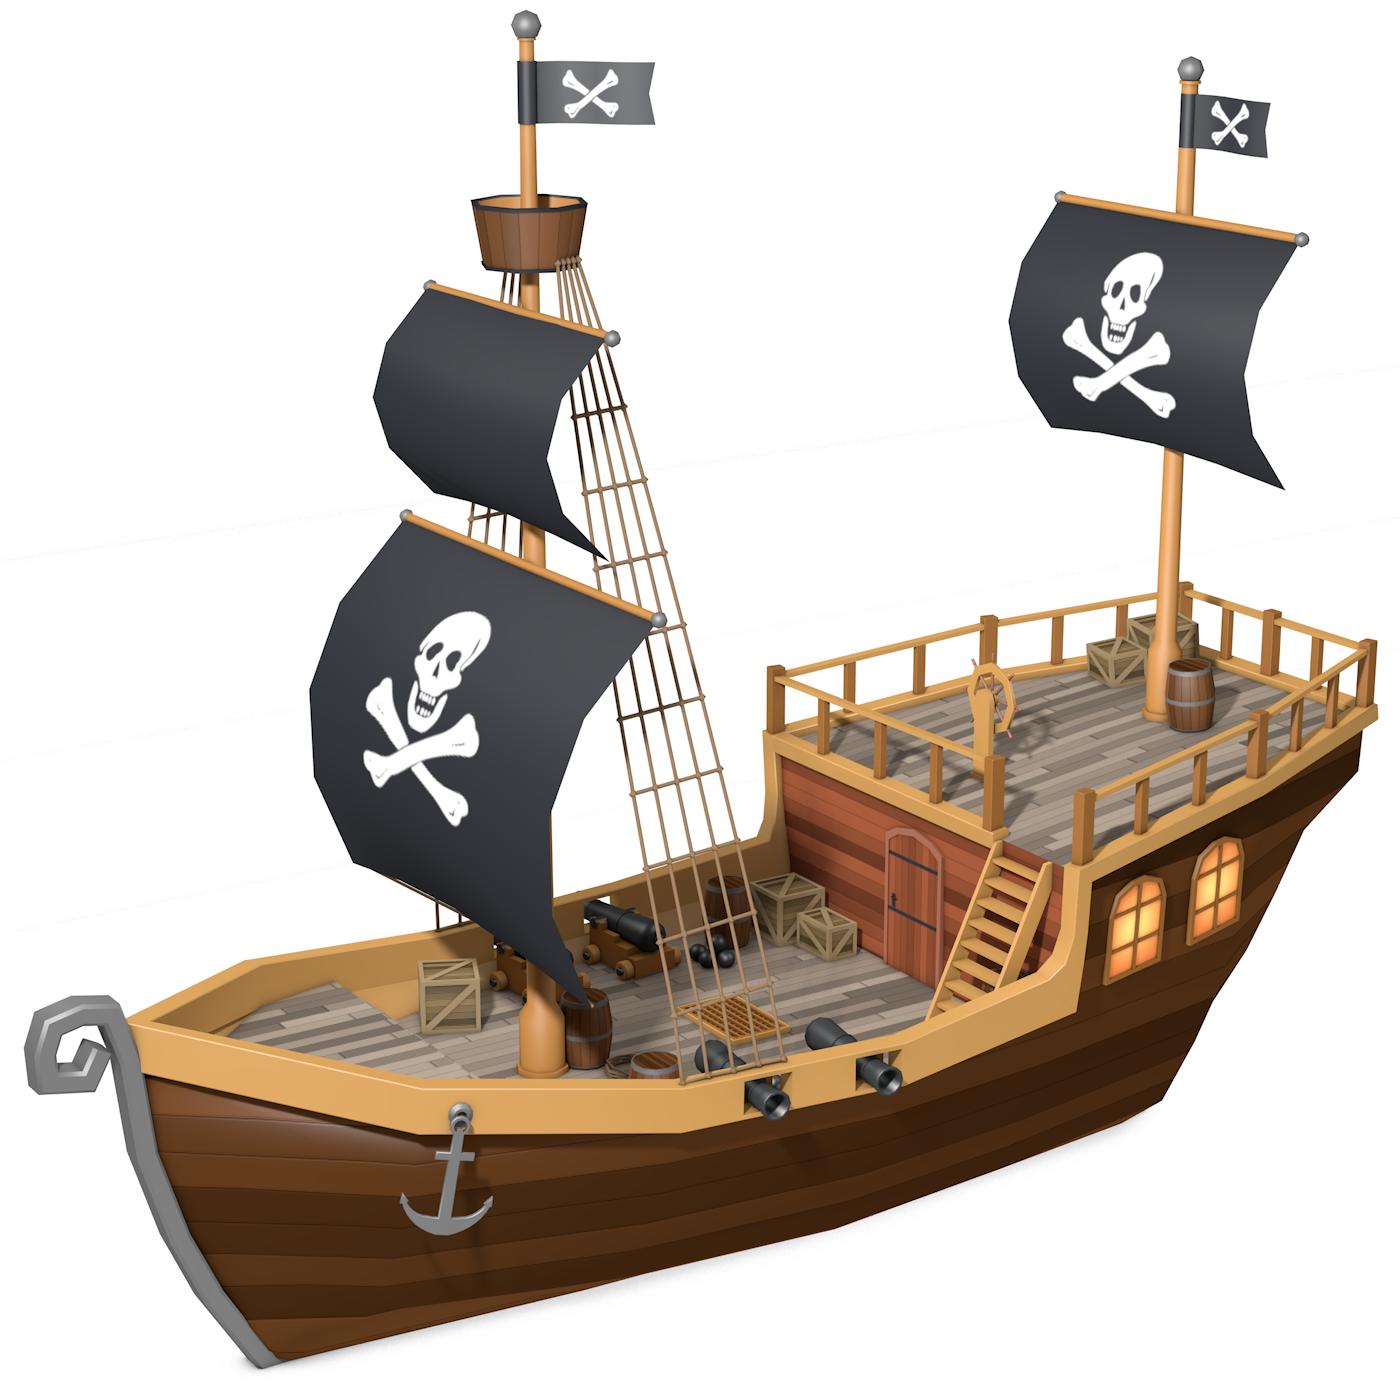 Low Poly Pirate Ship Pirate Ship Pirate Ship Model Pirate Ship Drawing